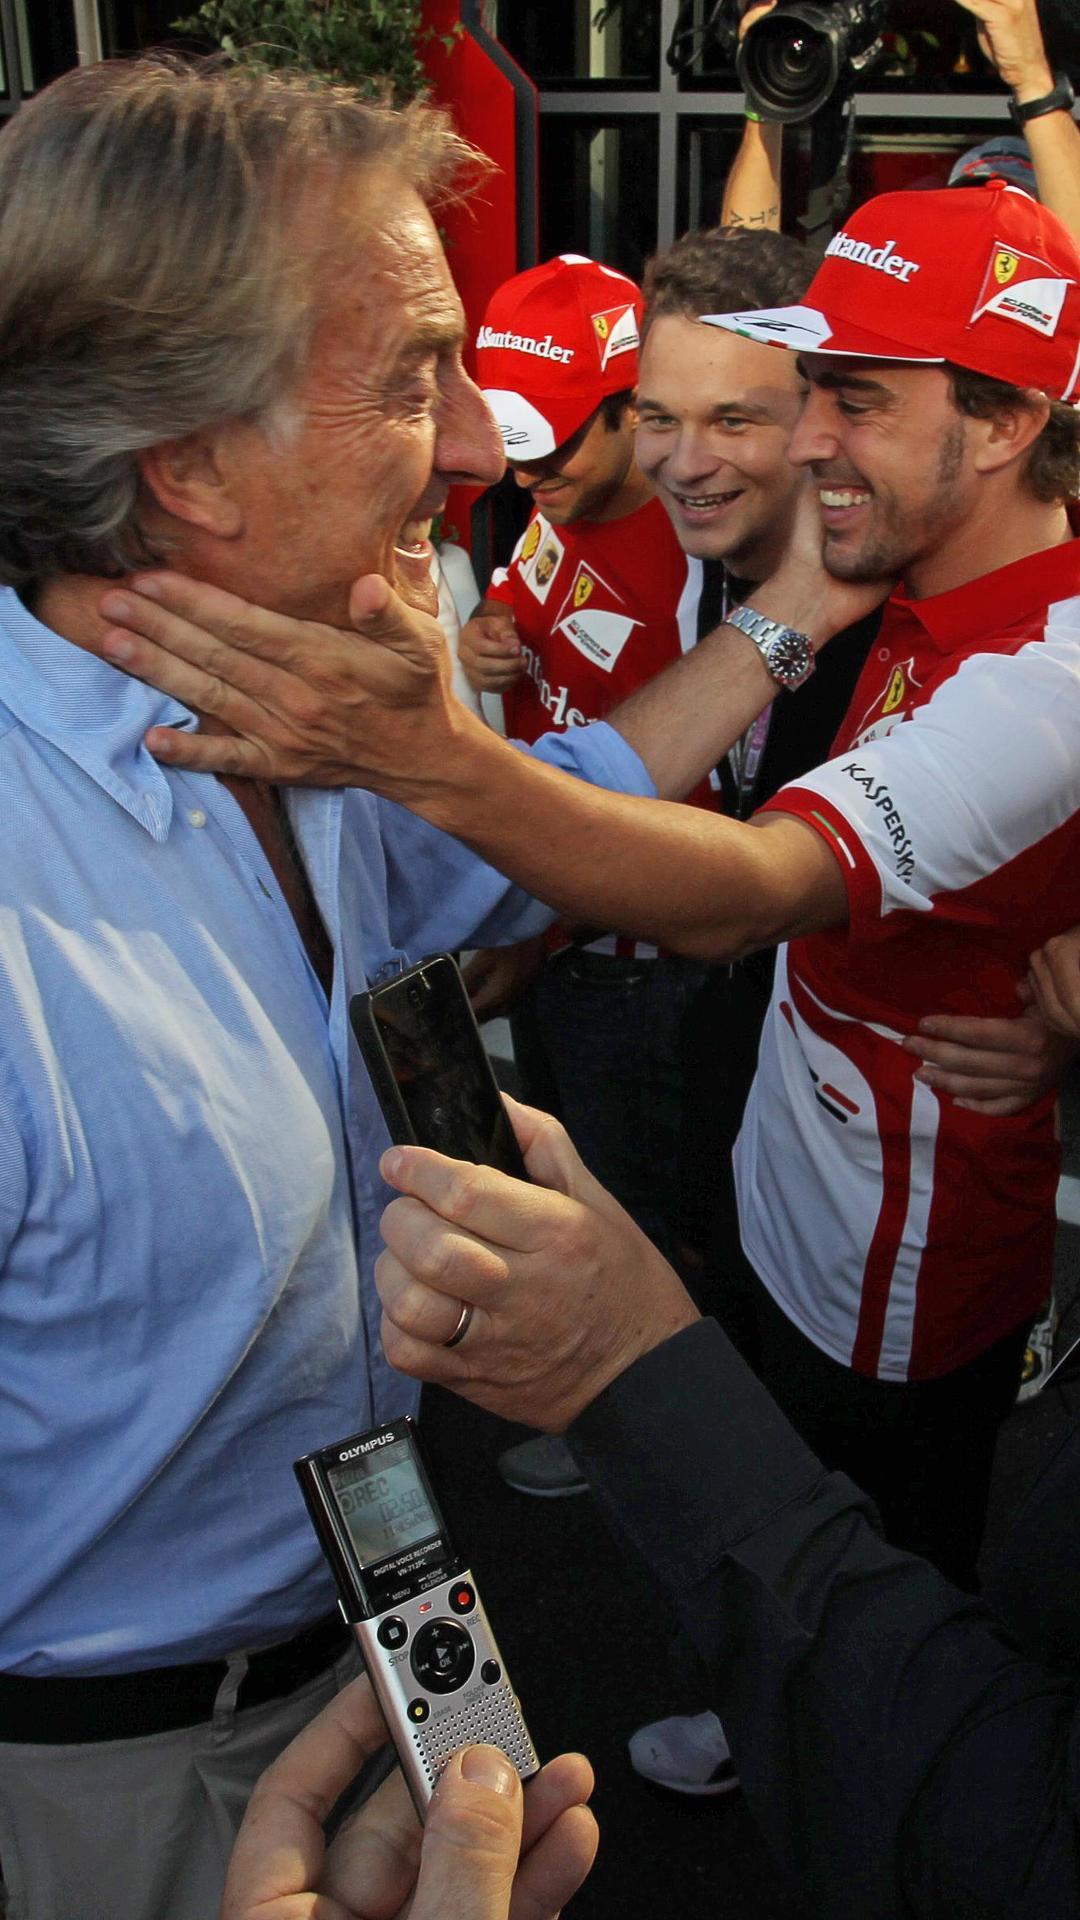 Montezemolo slaps Alonso with Twitter ban